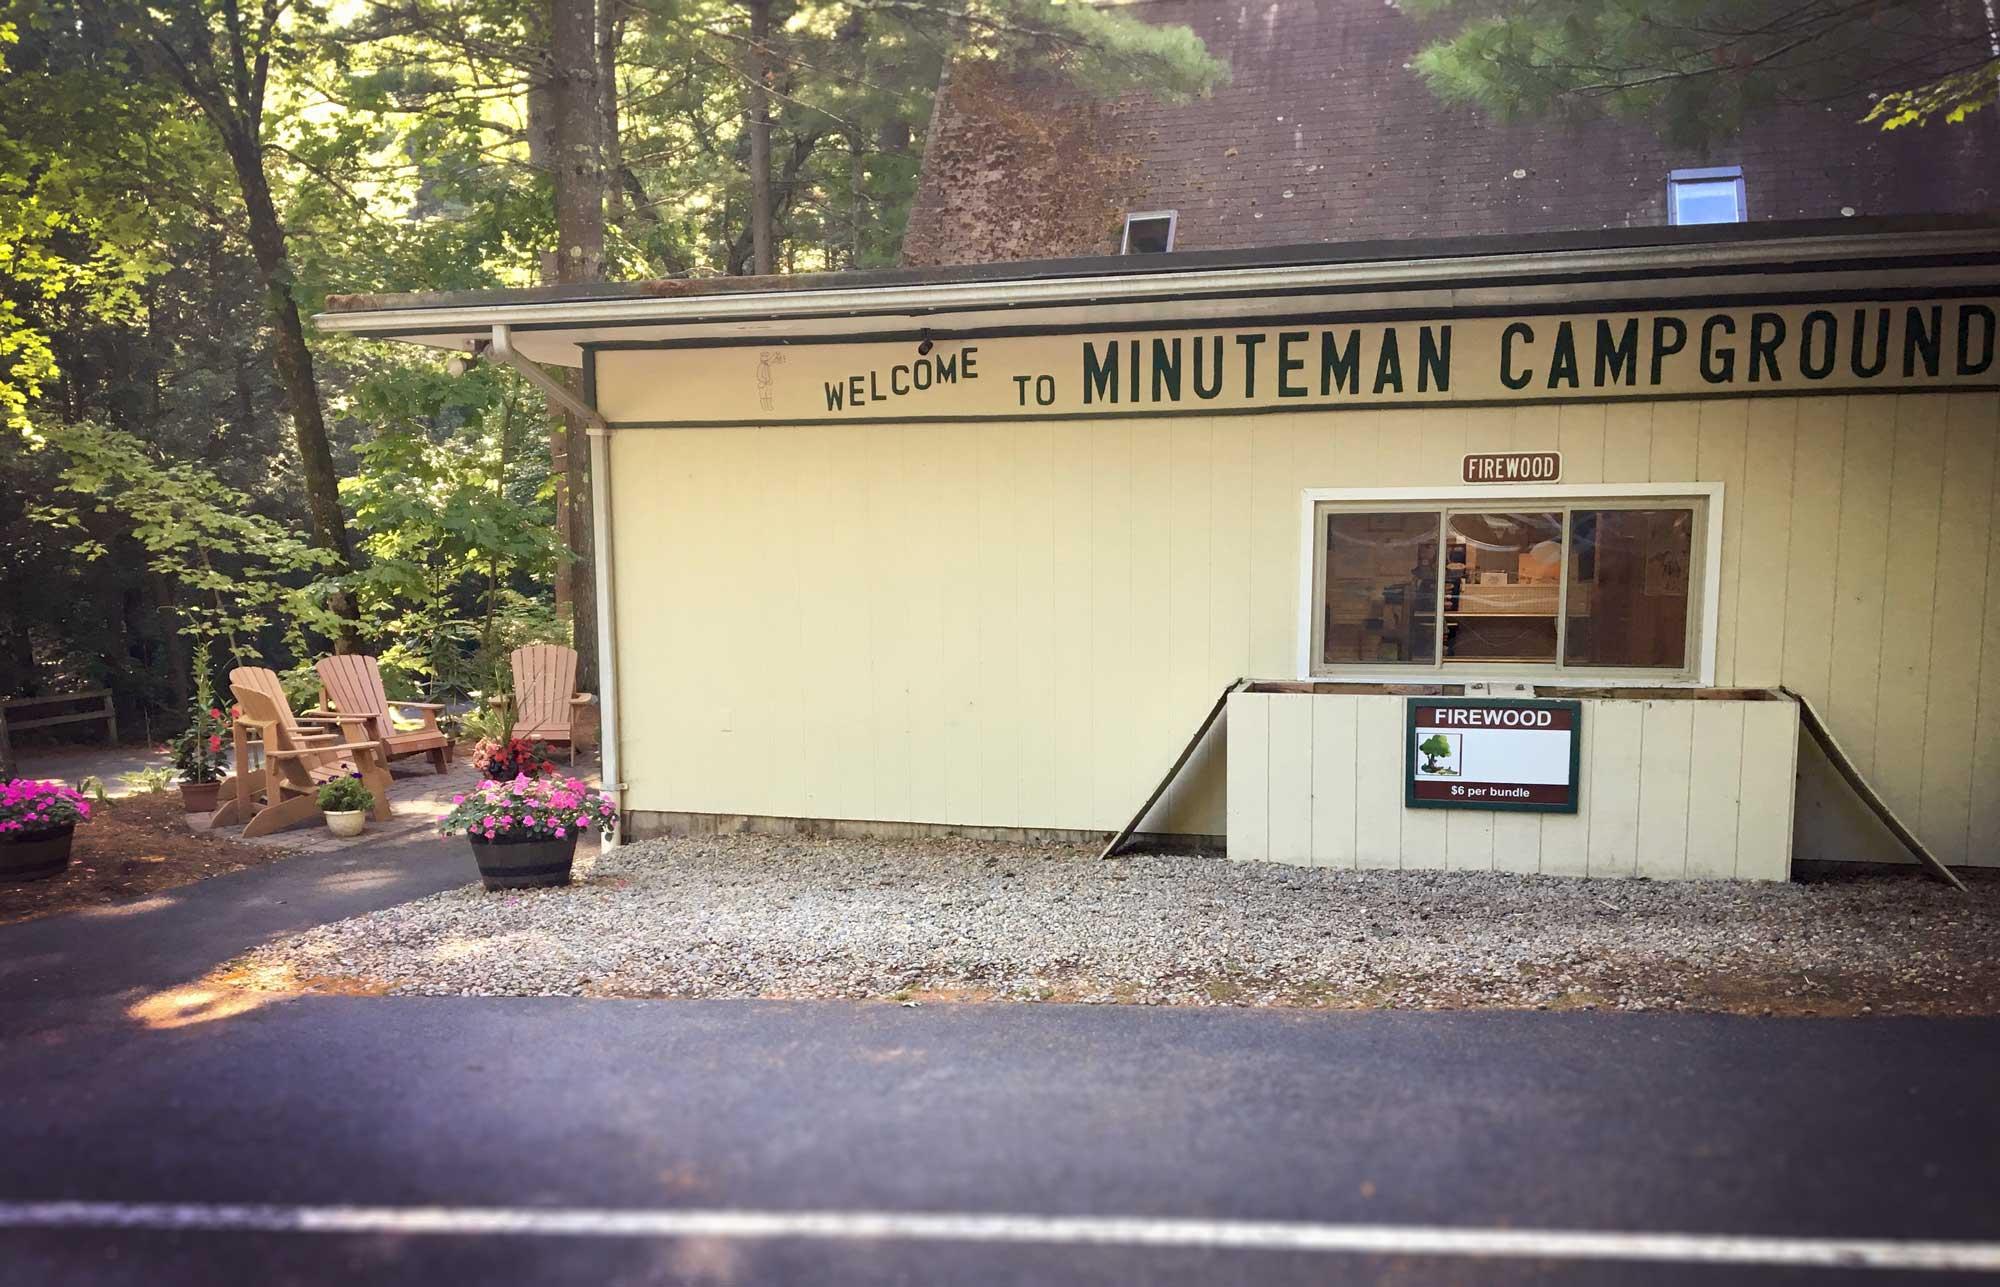 Exterior Boston Minuteman Campground check in building, Massachusetts